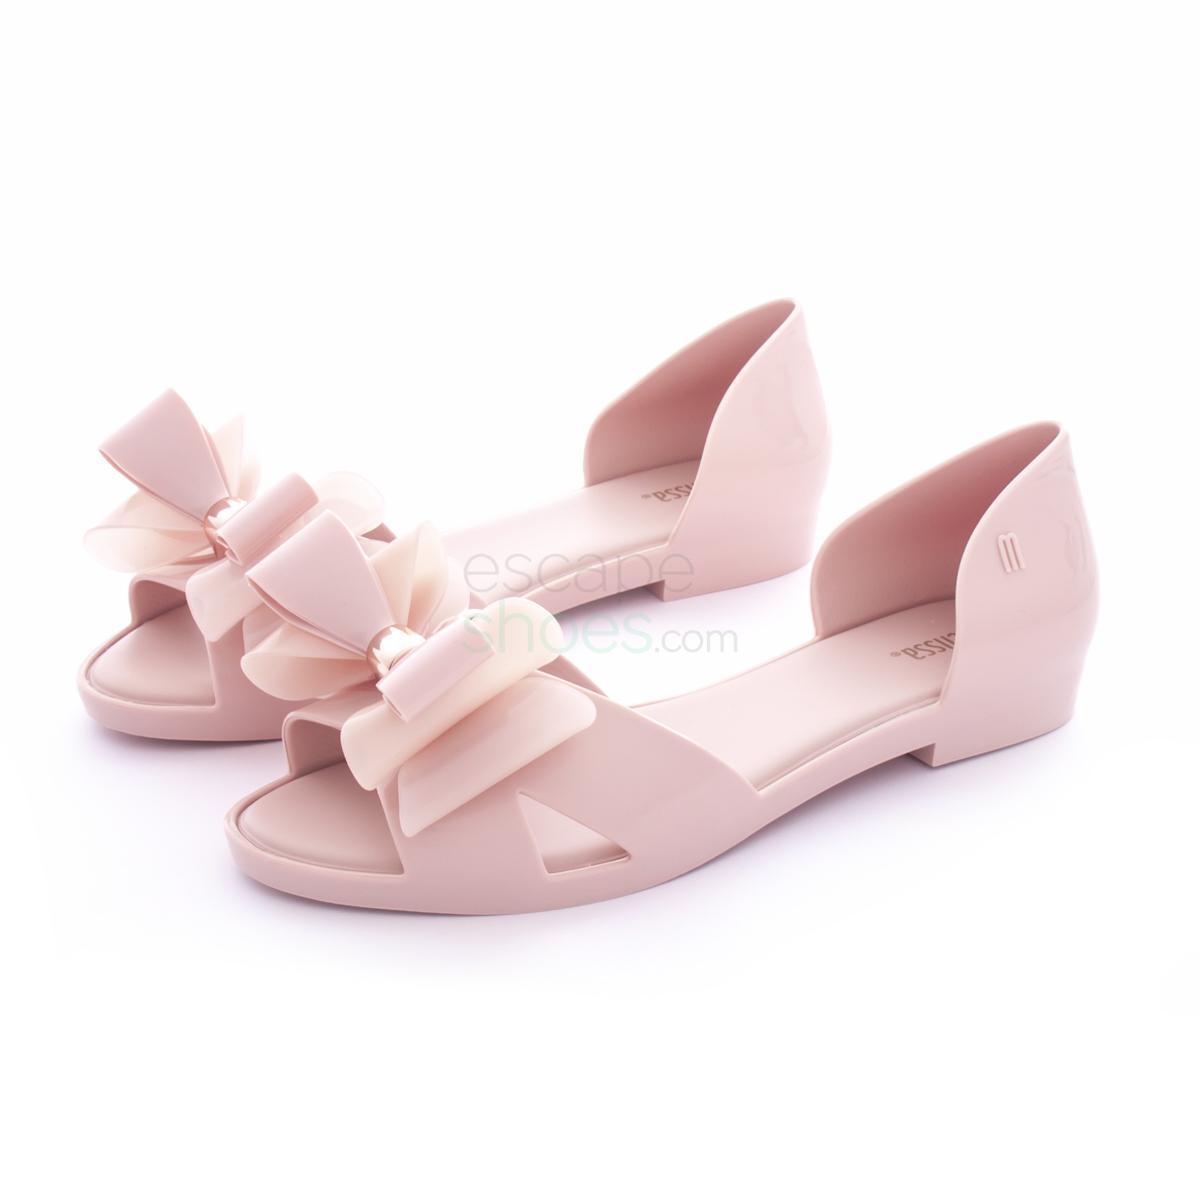 3429b27d64d88 Sandals MELISSA Seduction II Pink MW.17.032A